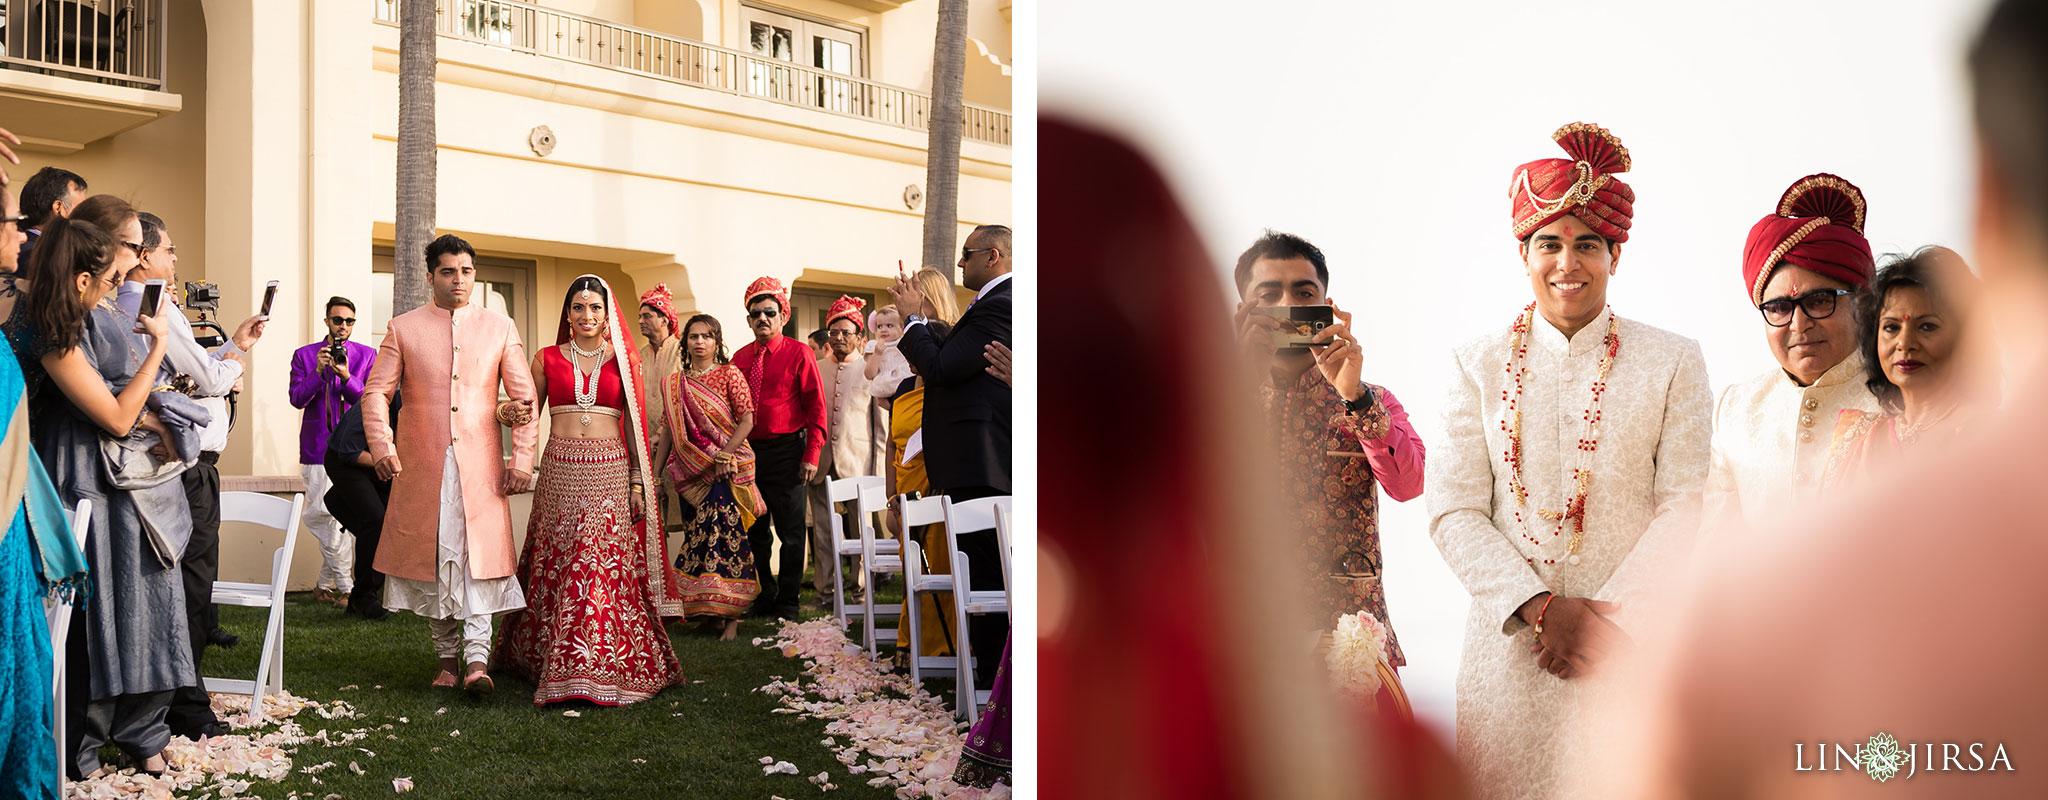 24 ritz carlton laguna niguel indian wedding ceremony photography